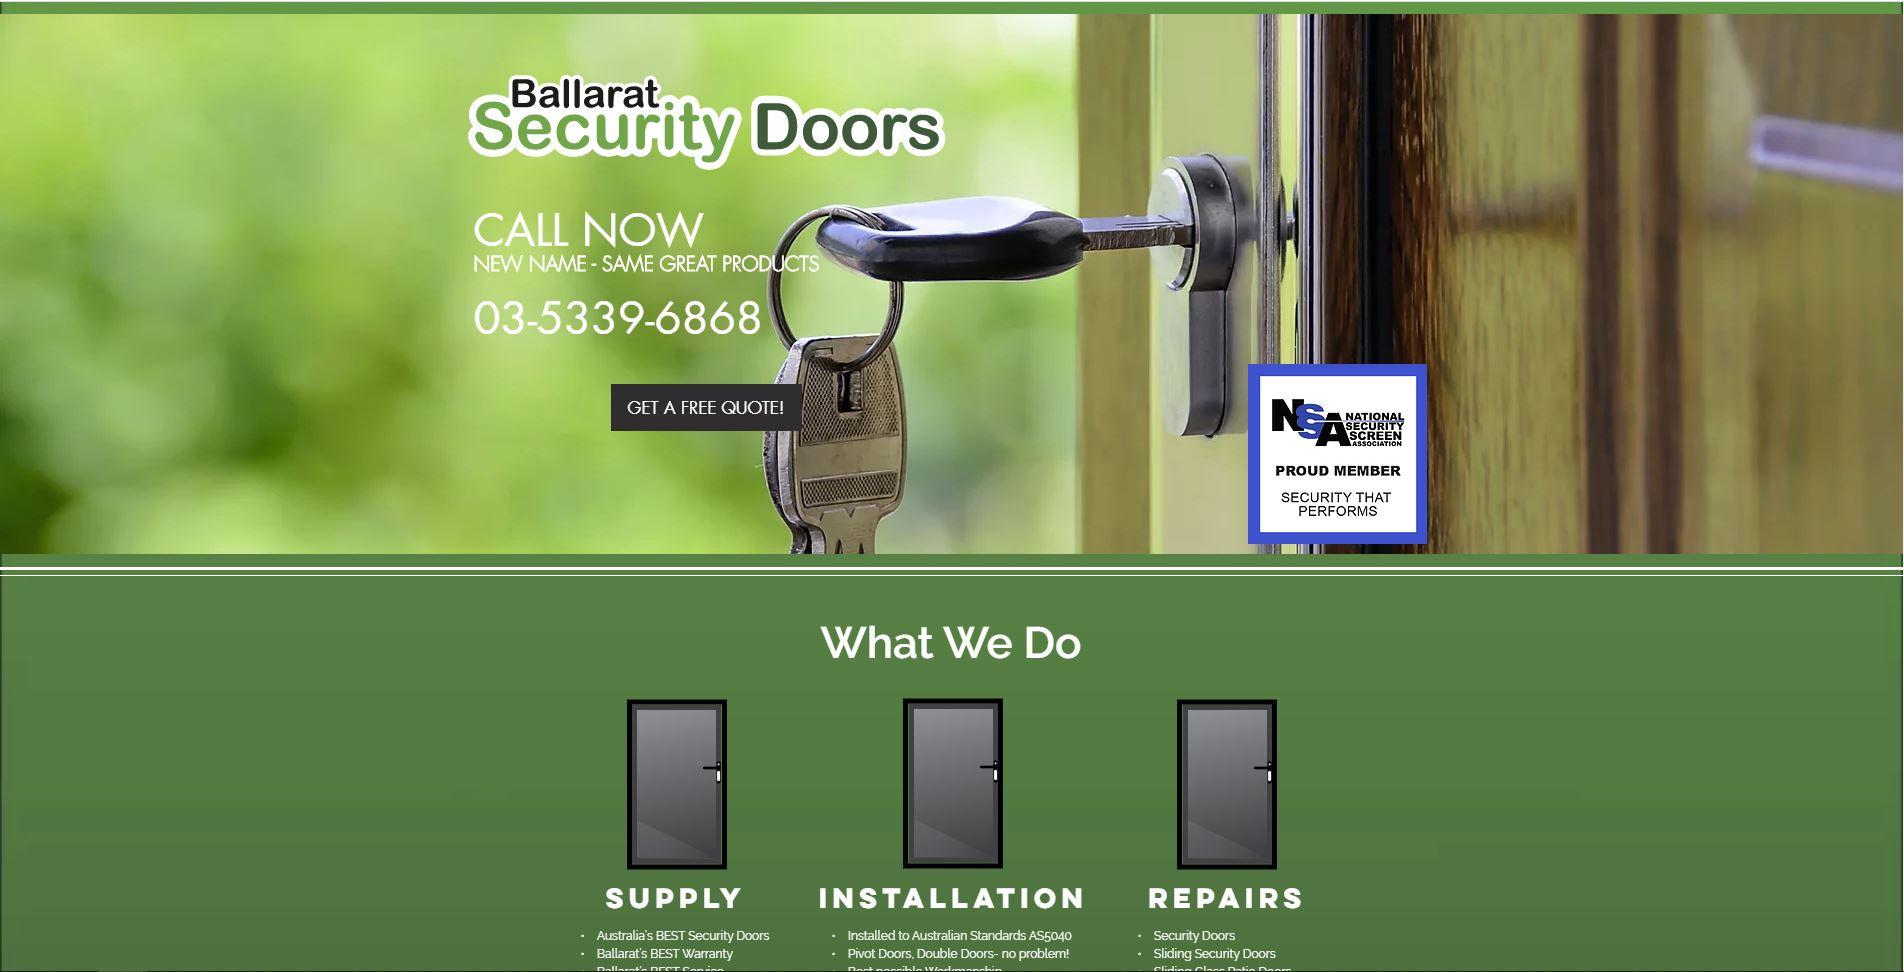 Ballarat Security Doors